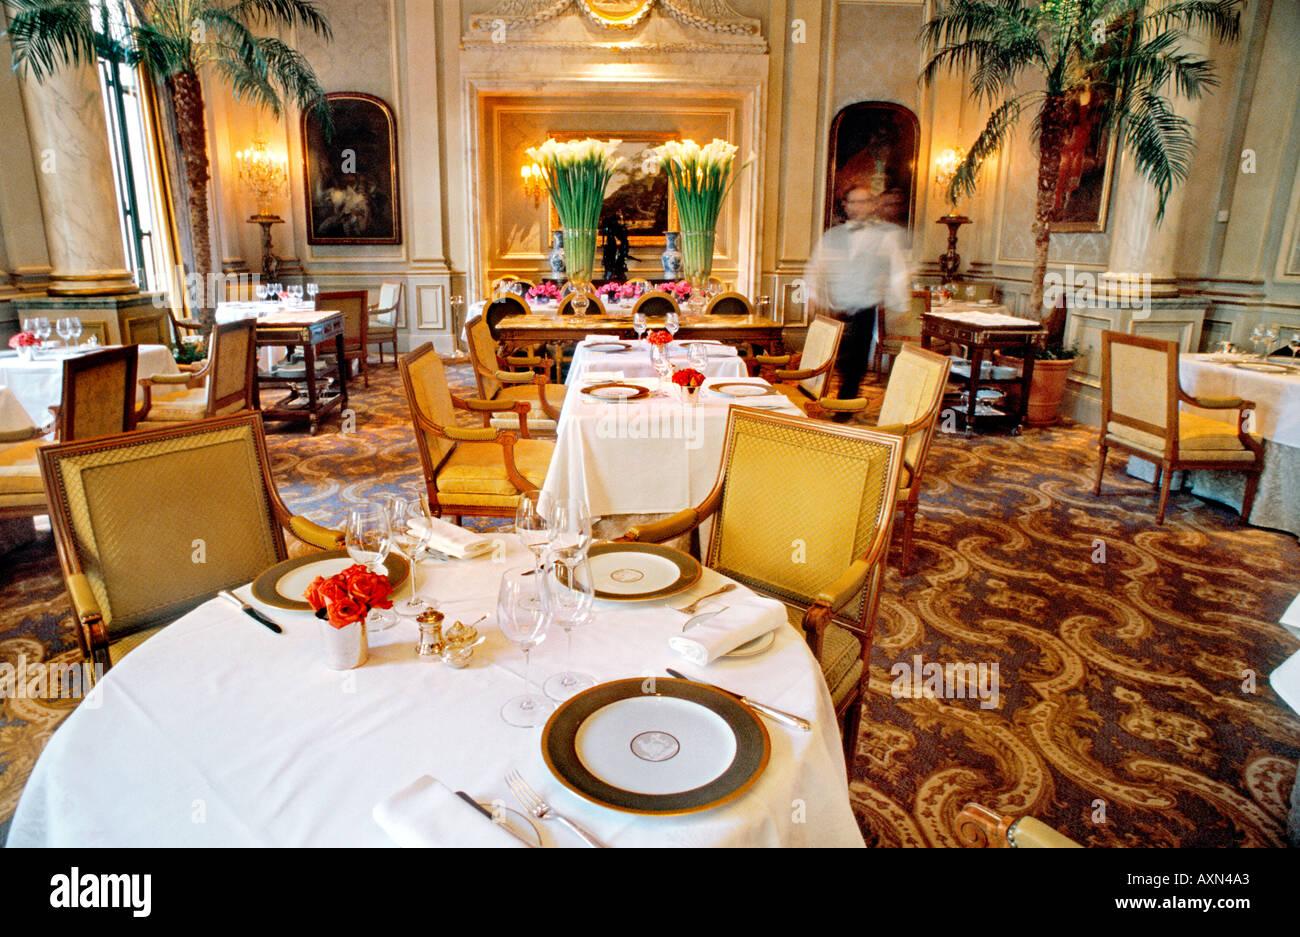 france paris inside fancy dining room french restaurant le v le cinq haute cuisine luxury hotel four seasons george v